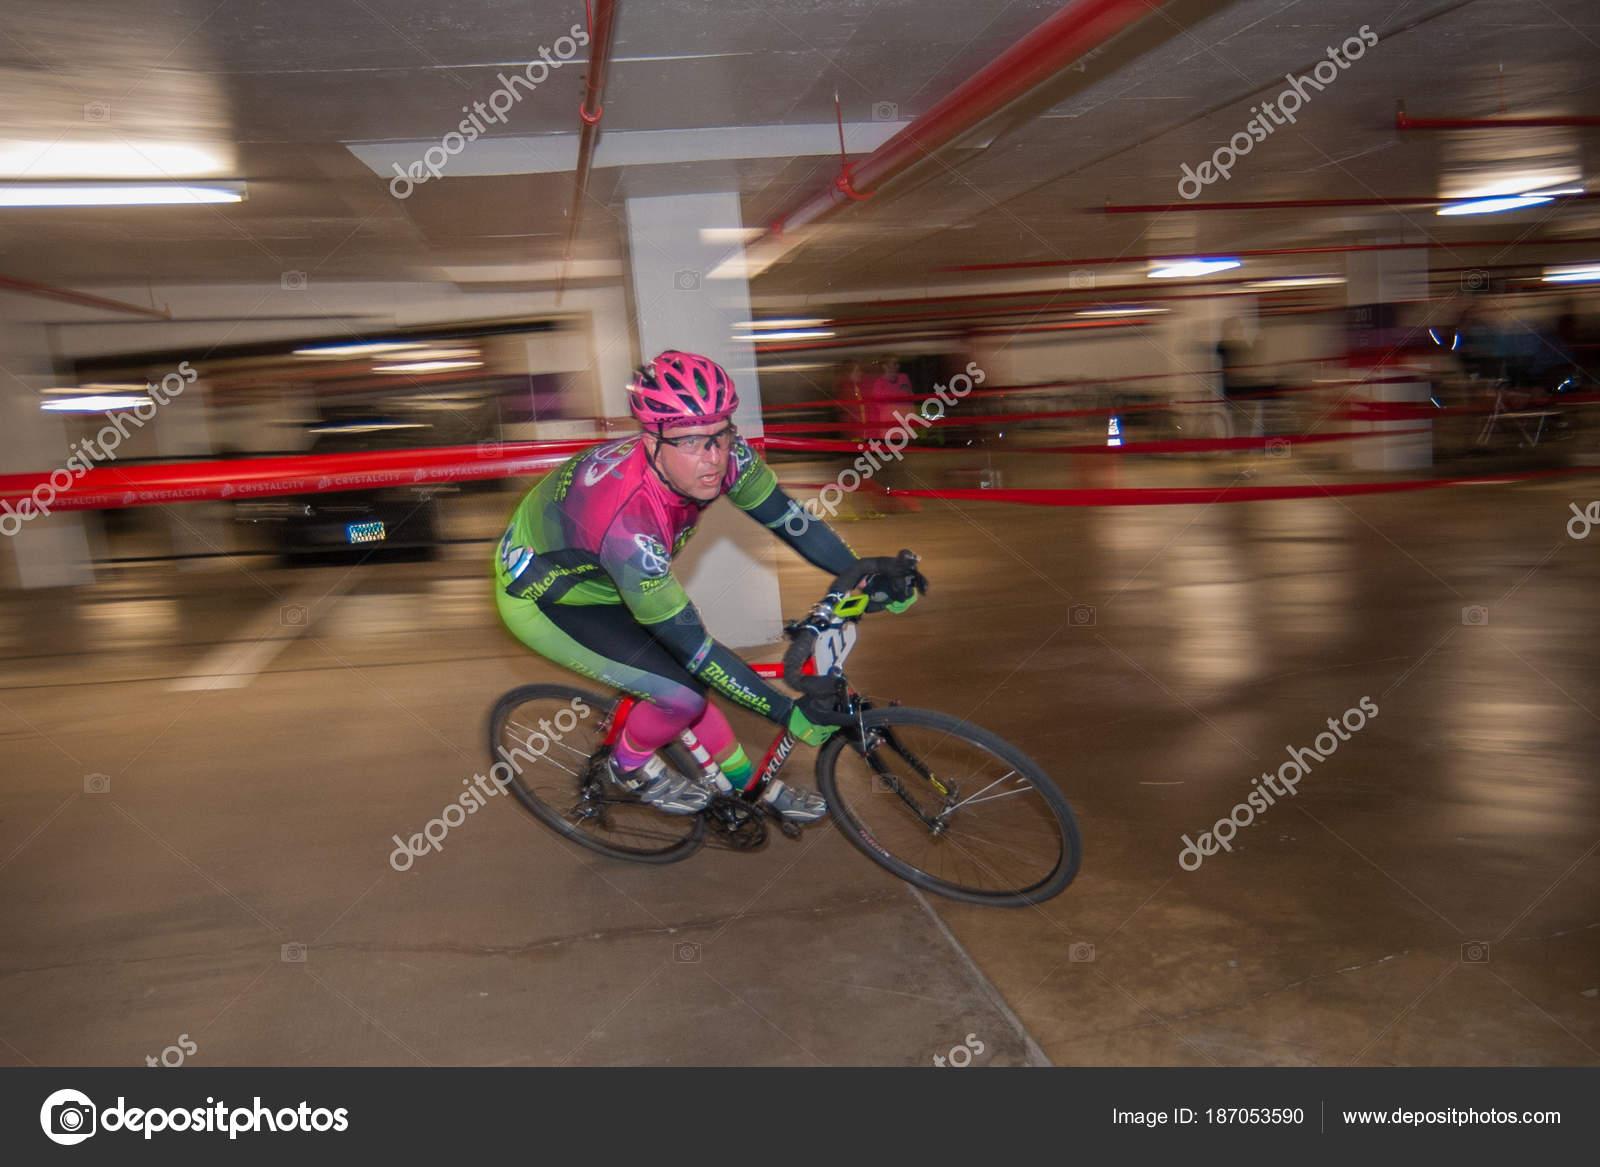 Cyclist Races Underground Crosshairs Garage Race March 2018